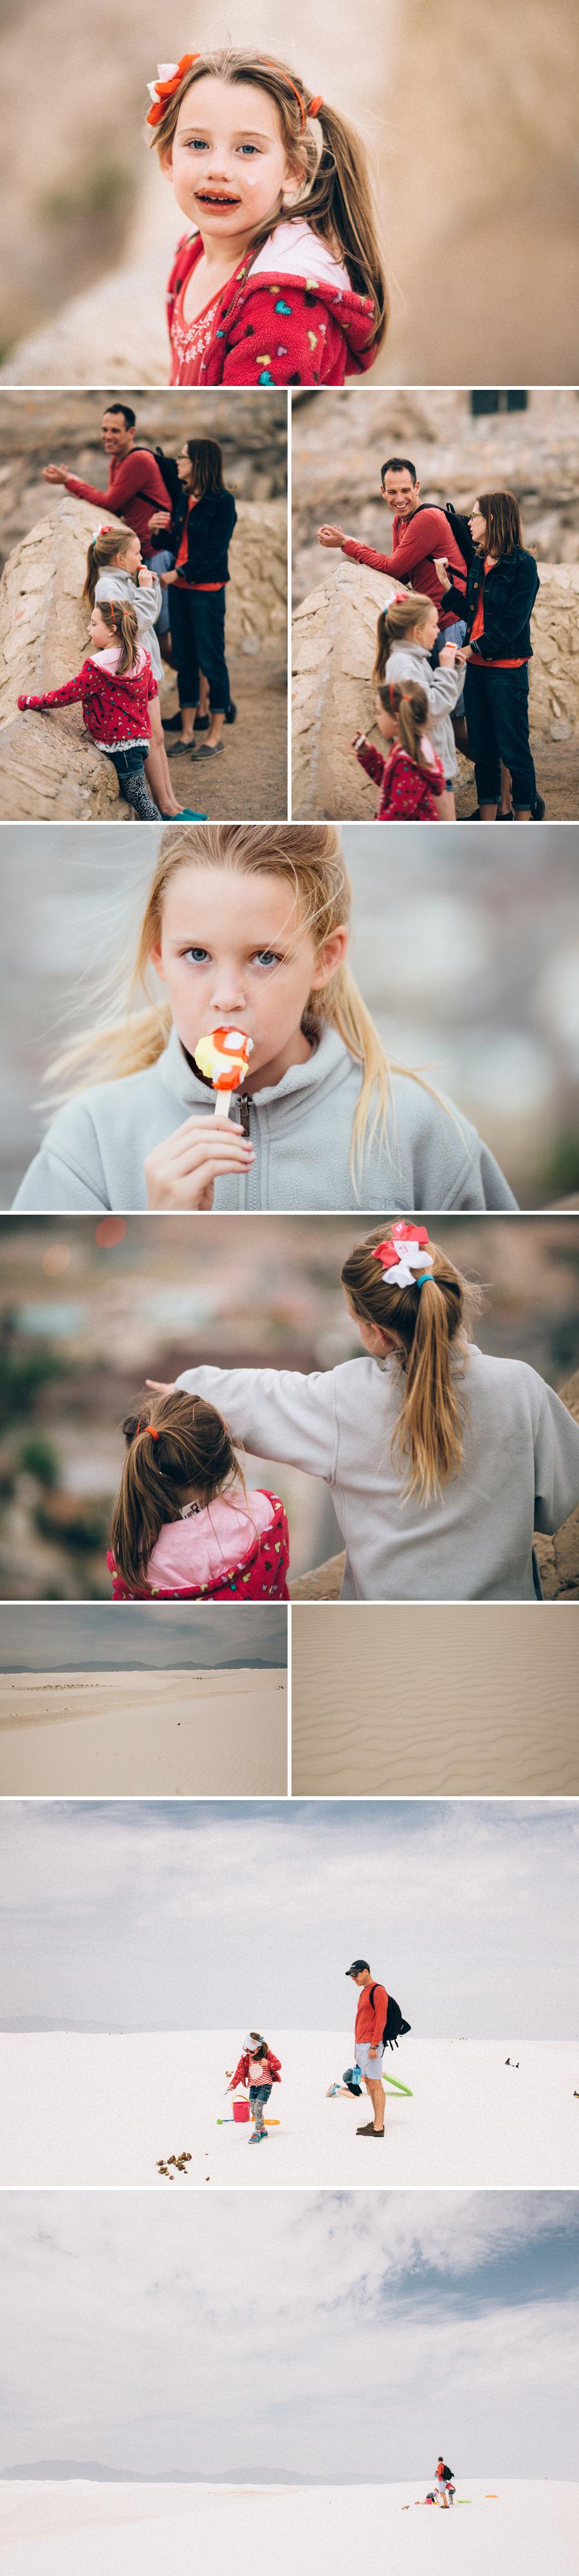 ElPaso-Family-Photographercomp002